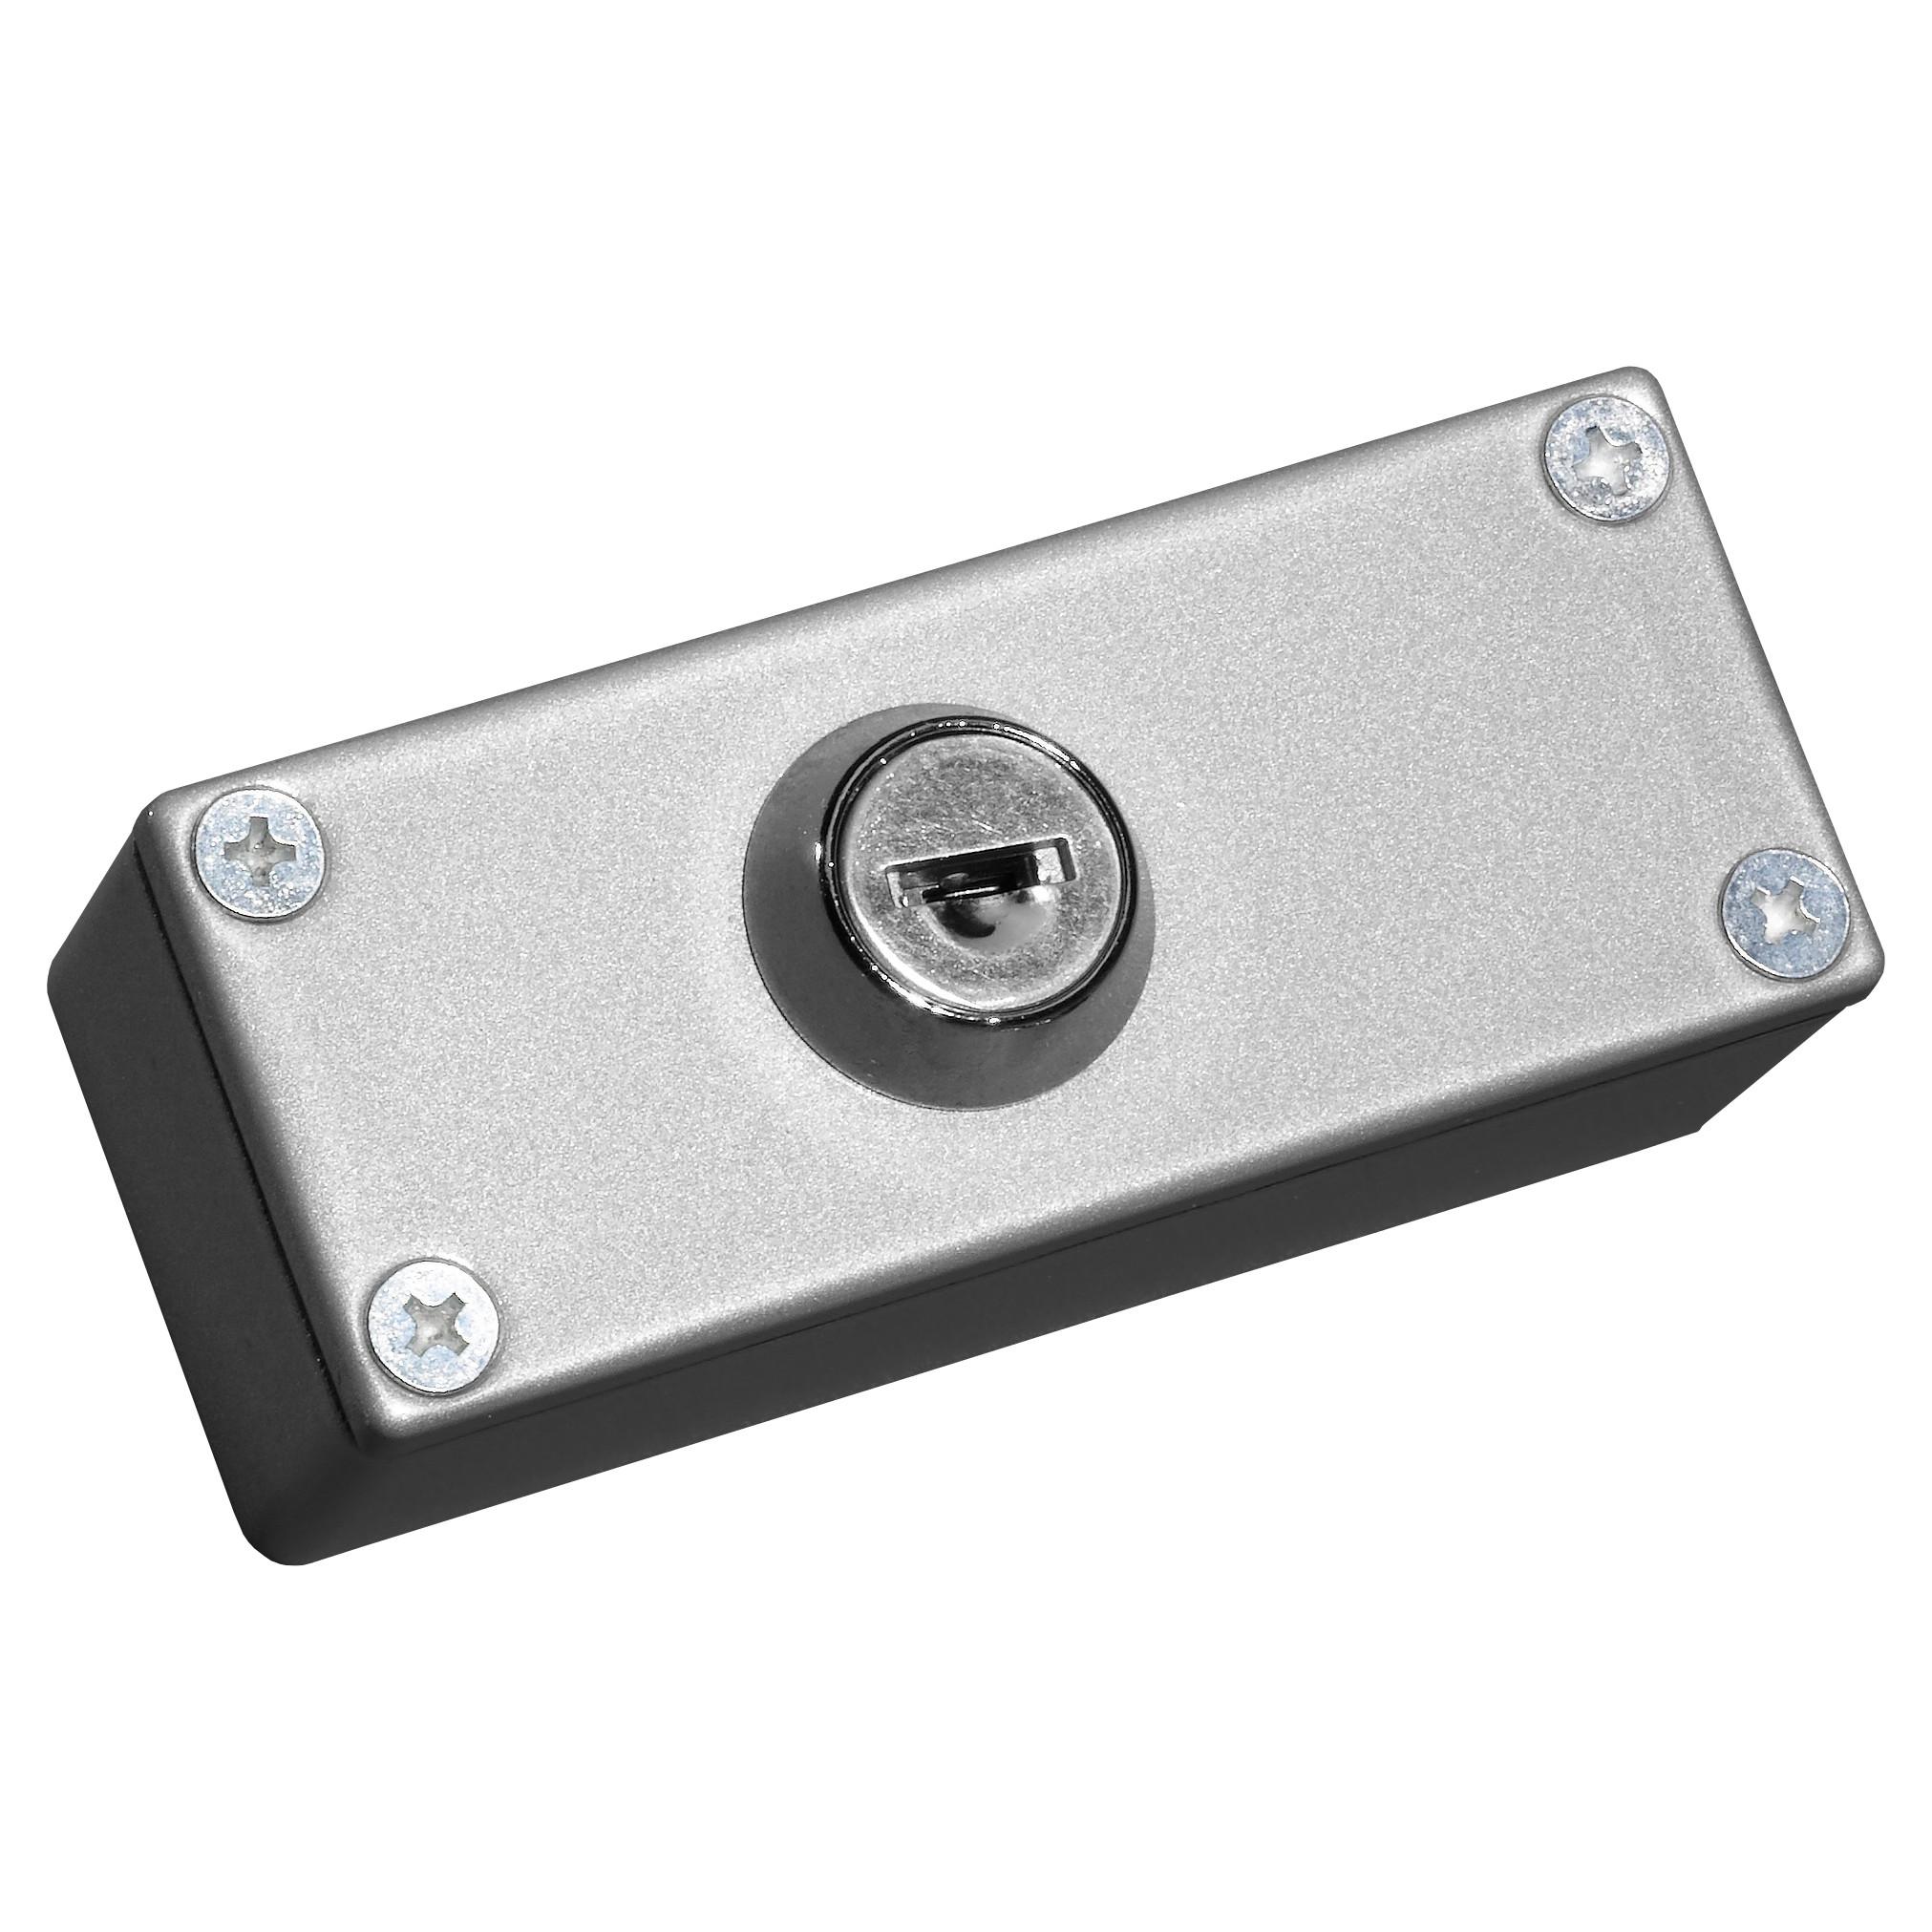 Pass Key Switch - Diecast Aluminium, Double Pole, Tampered, Keys ...